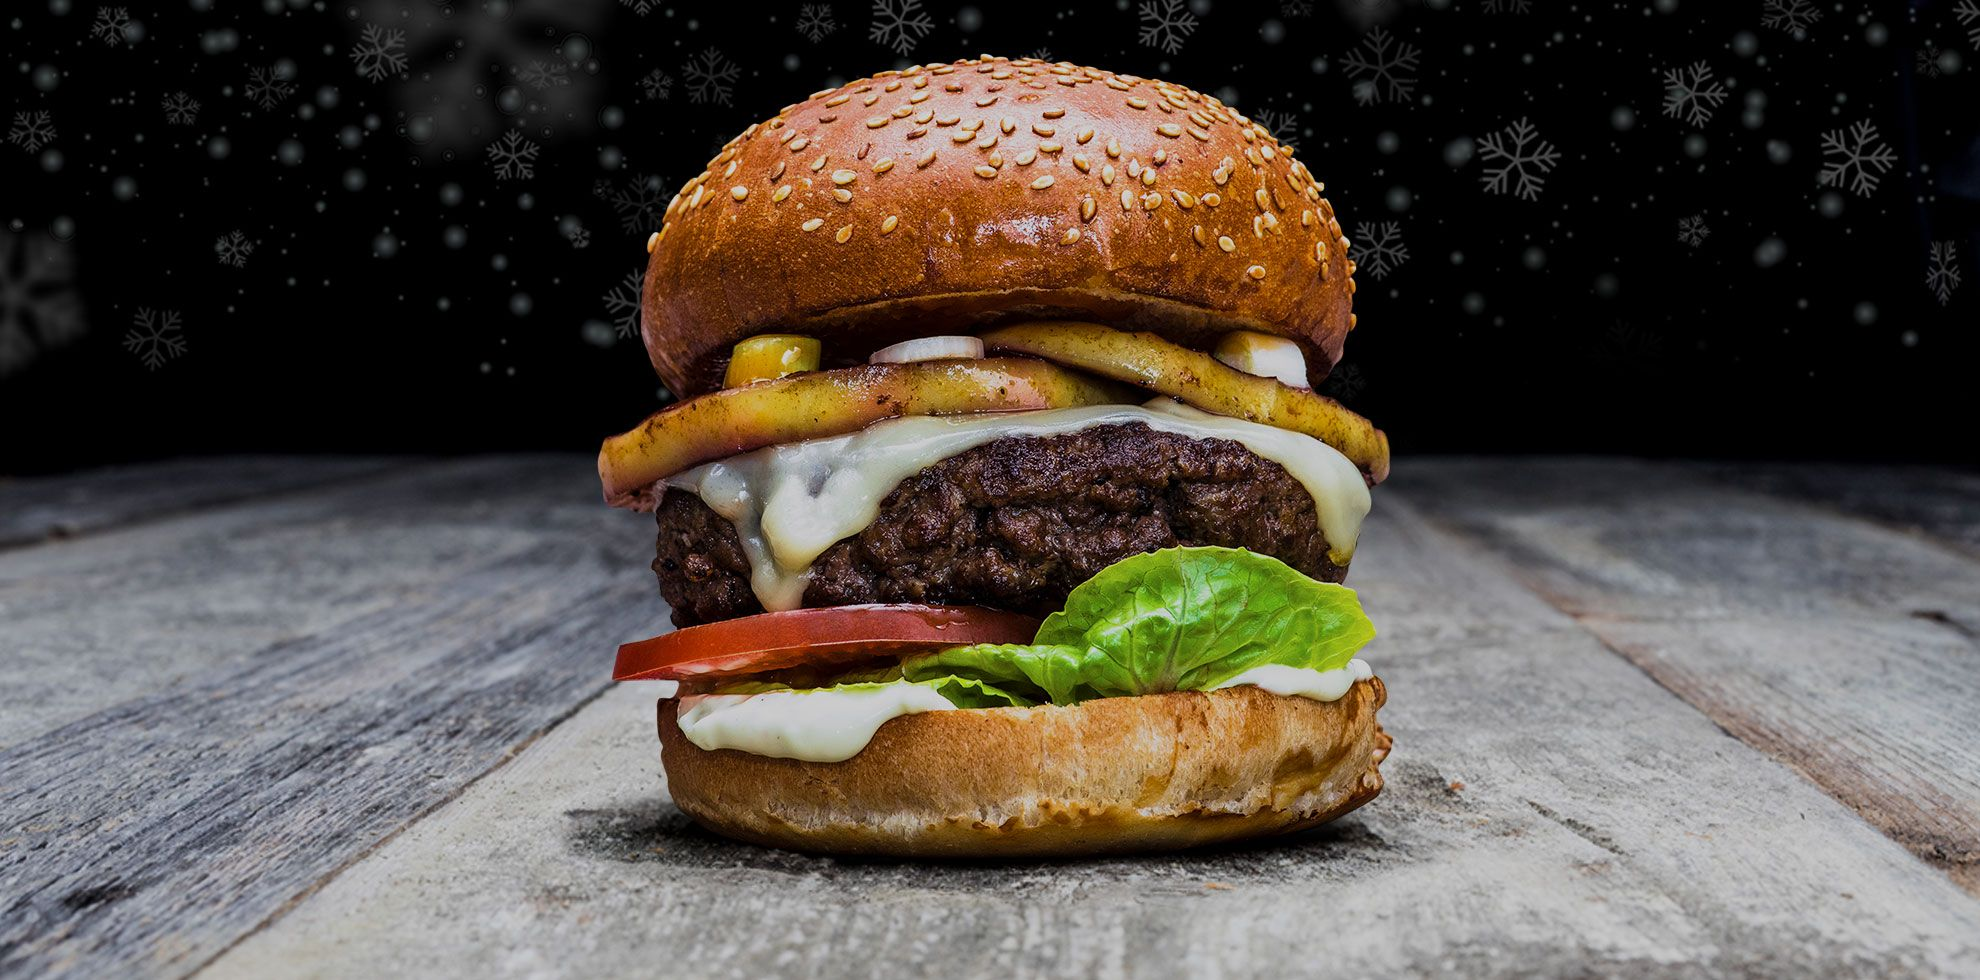 Qmuh Burger - Winter Wonder